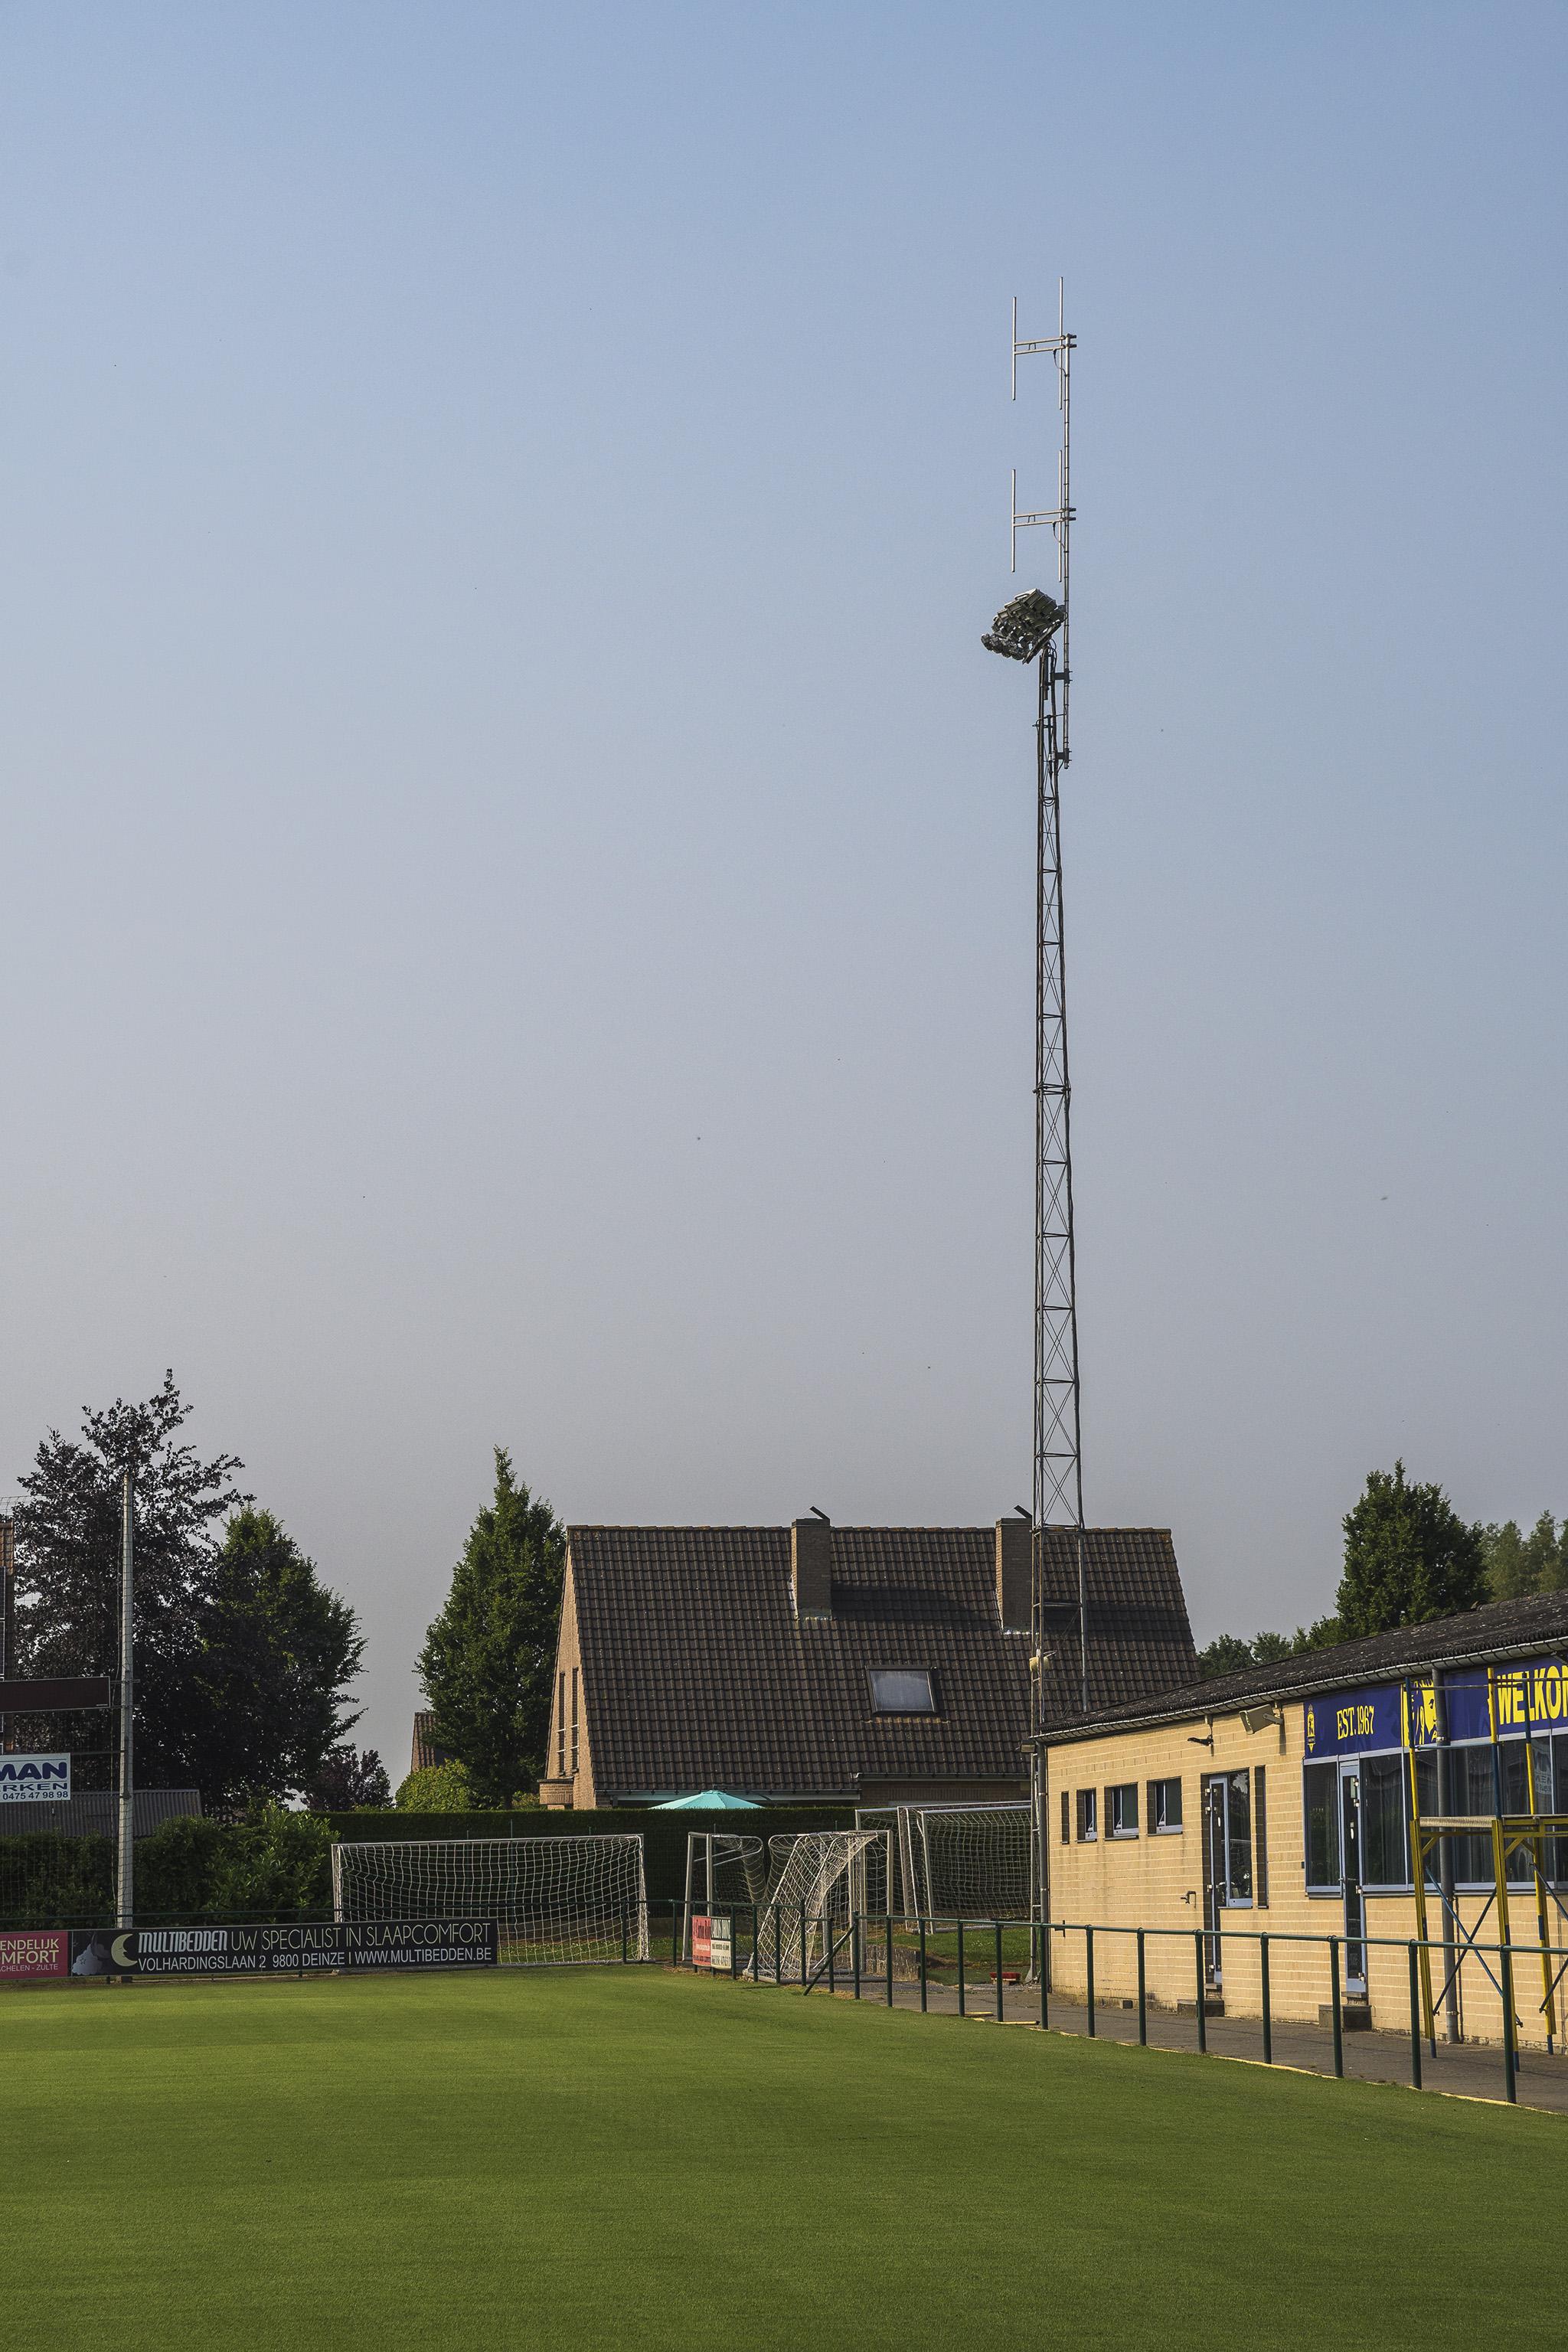 Project KSC Dikkelvenne